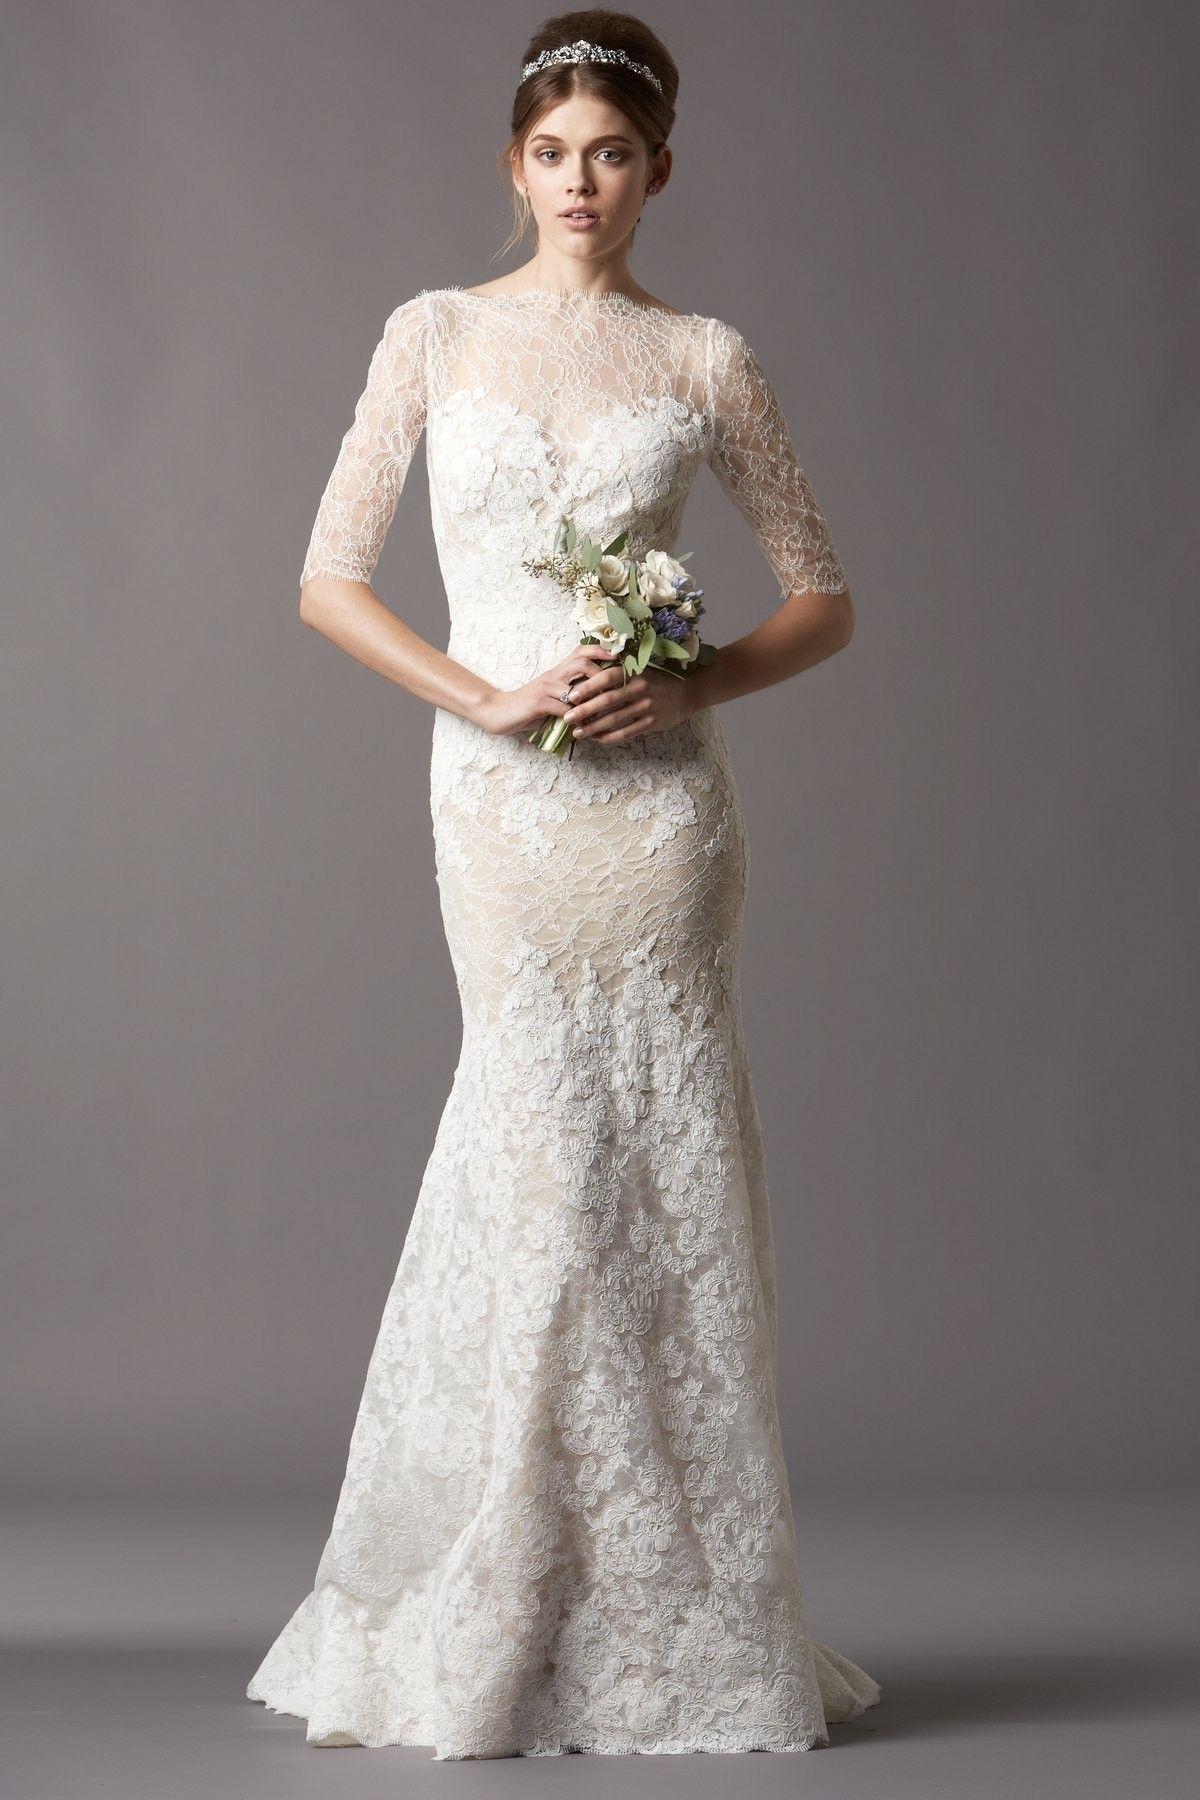 Modern wedding dresses with sleeves modern wedding dress modern wedding dresses with sleeves ombrellifo Gallery